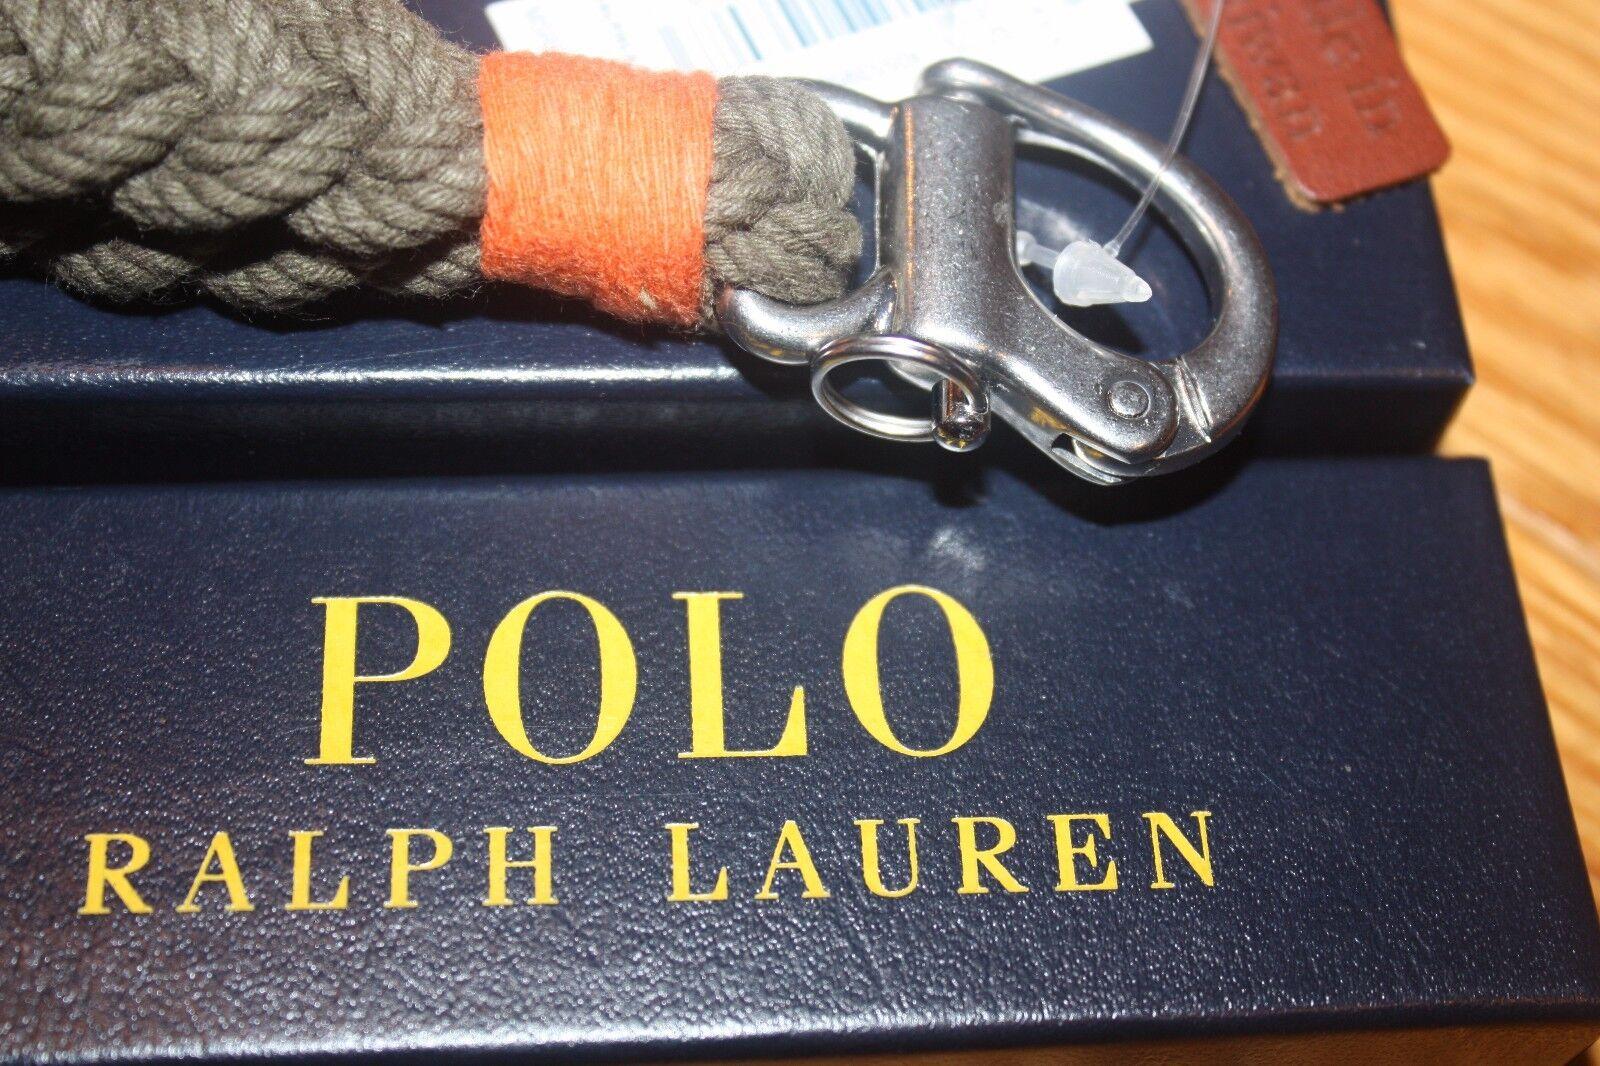 POLO Ralph Lauren Snap Shackle Braided Key Chain Fob NWT Boxed Indigo Blue